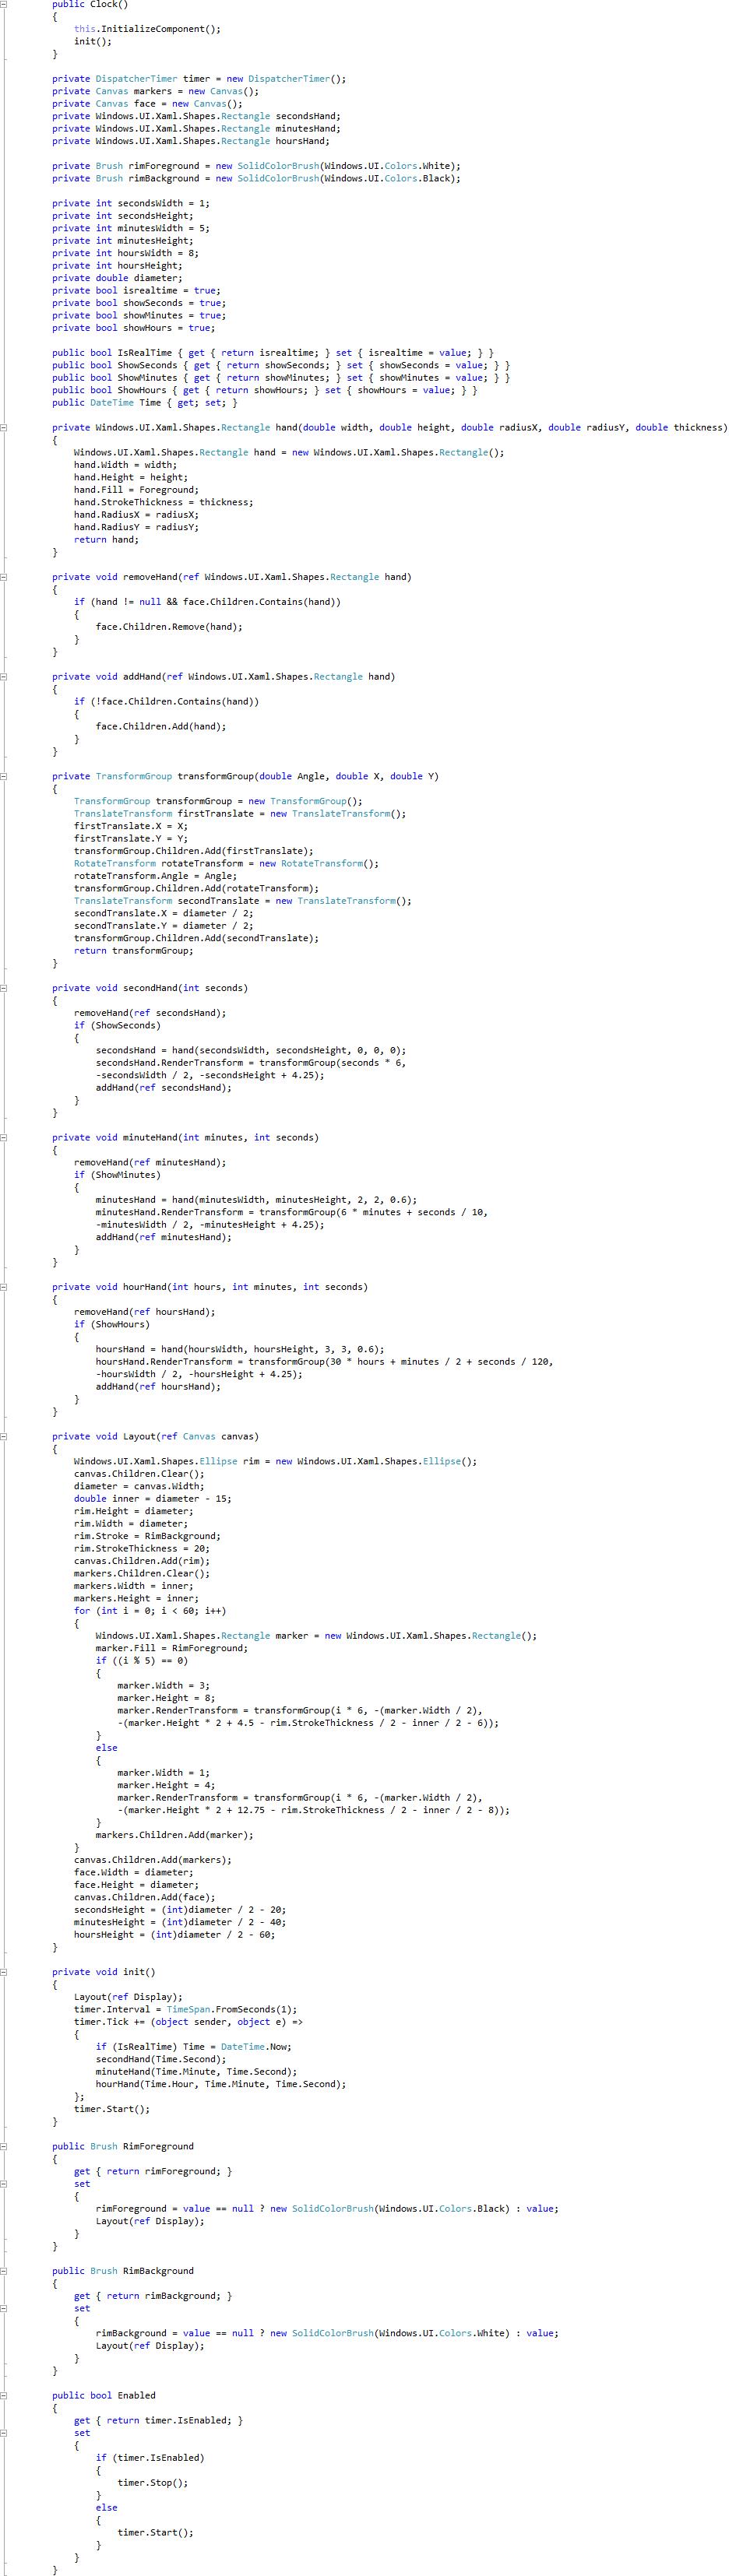 10-usercontrol-code-clockcontrol